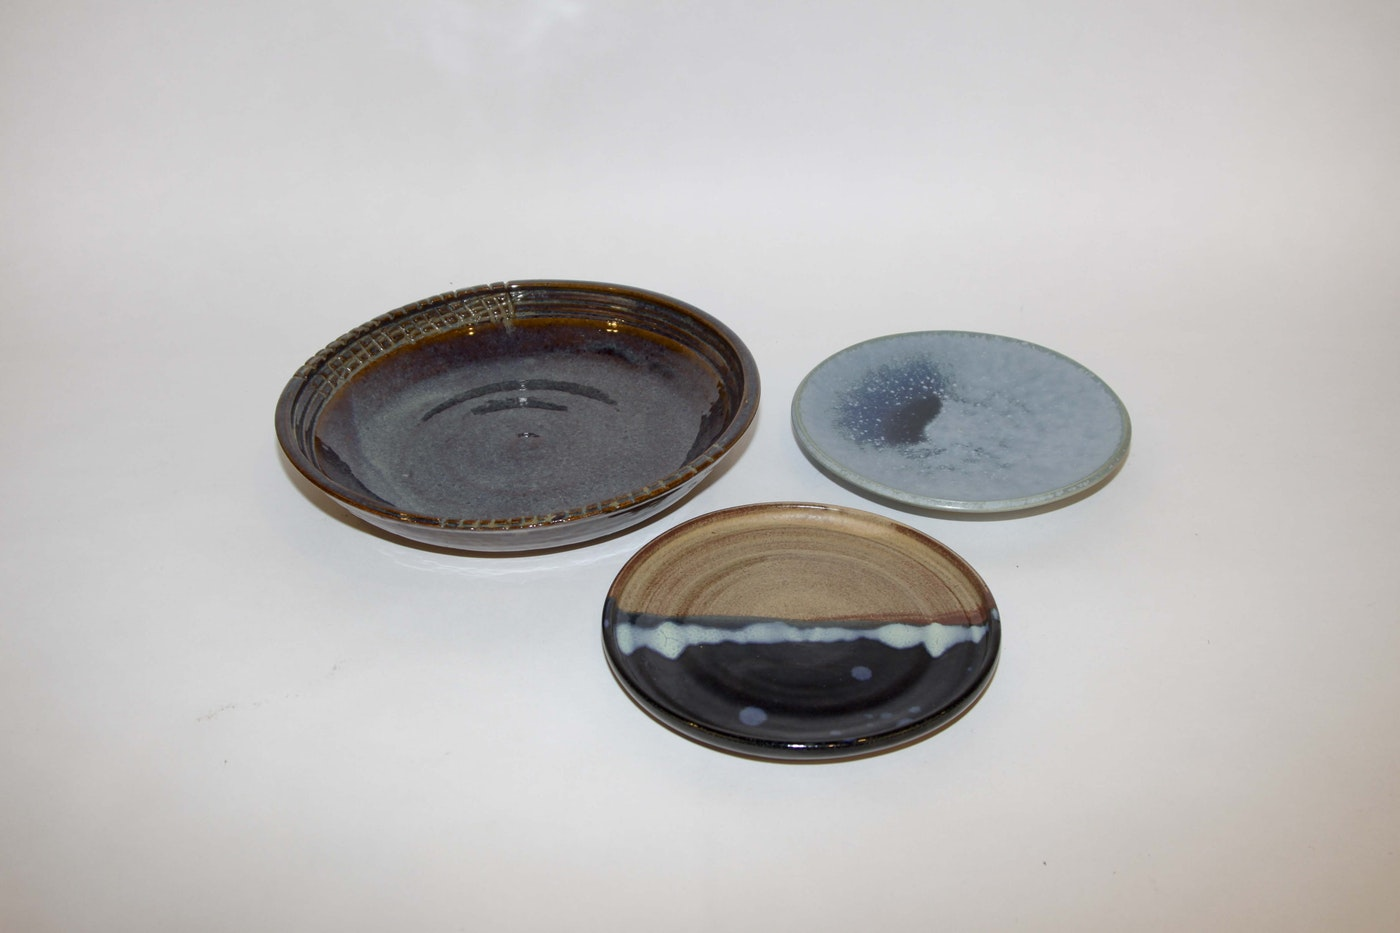 Hand Thrown Stoneware Serving Plates Ebth